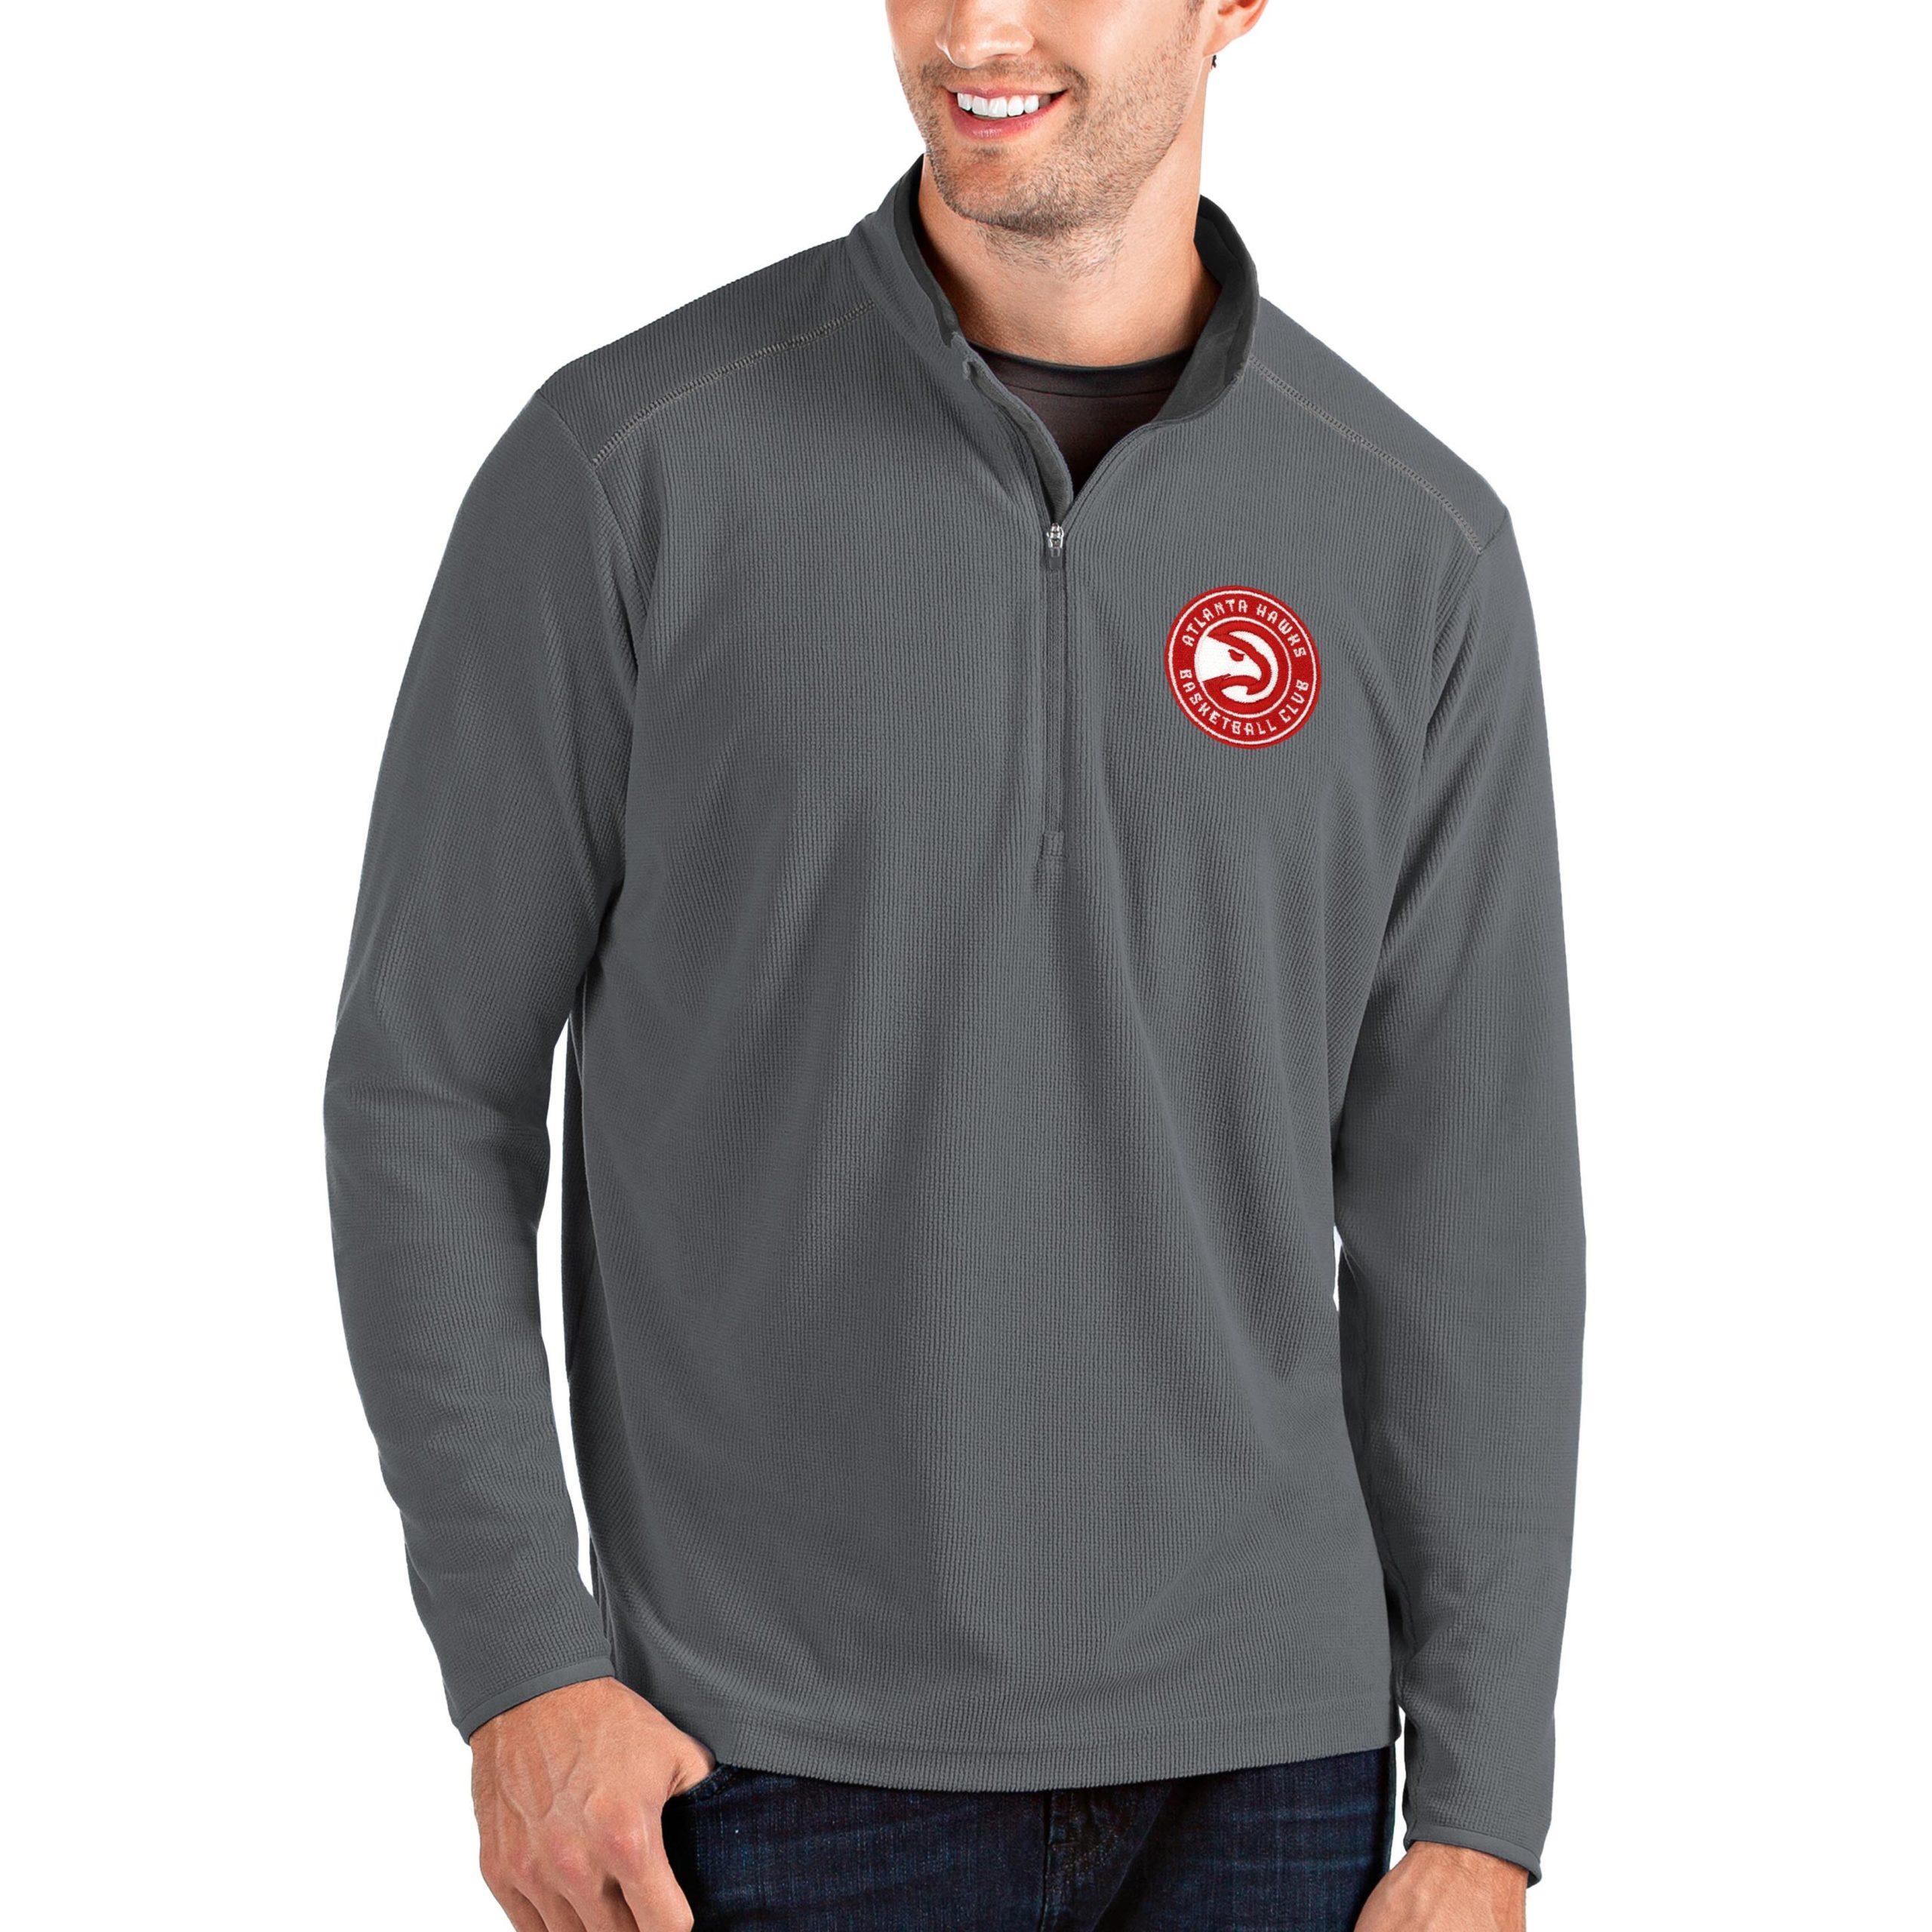 Atlanta Hawks Antigua Big & Tall Glacier Quarter-Zip Pullover Jacket - Gray/Gray